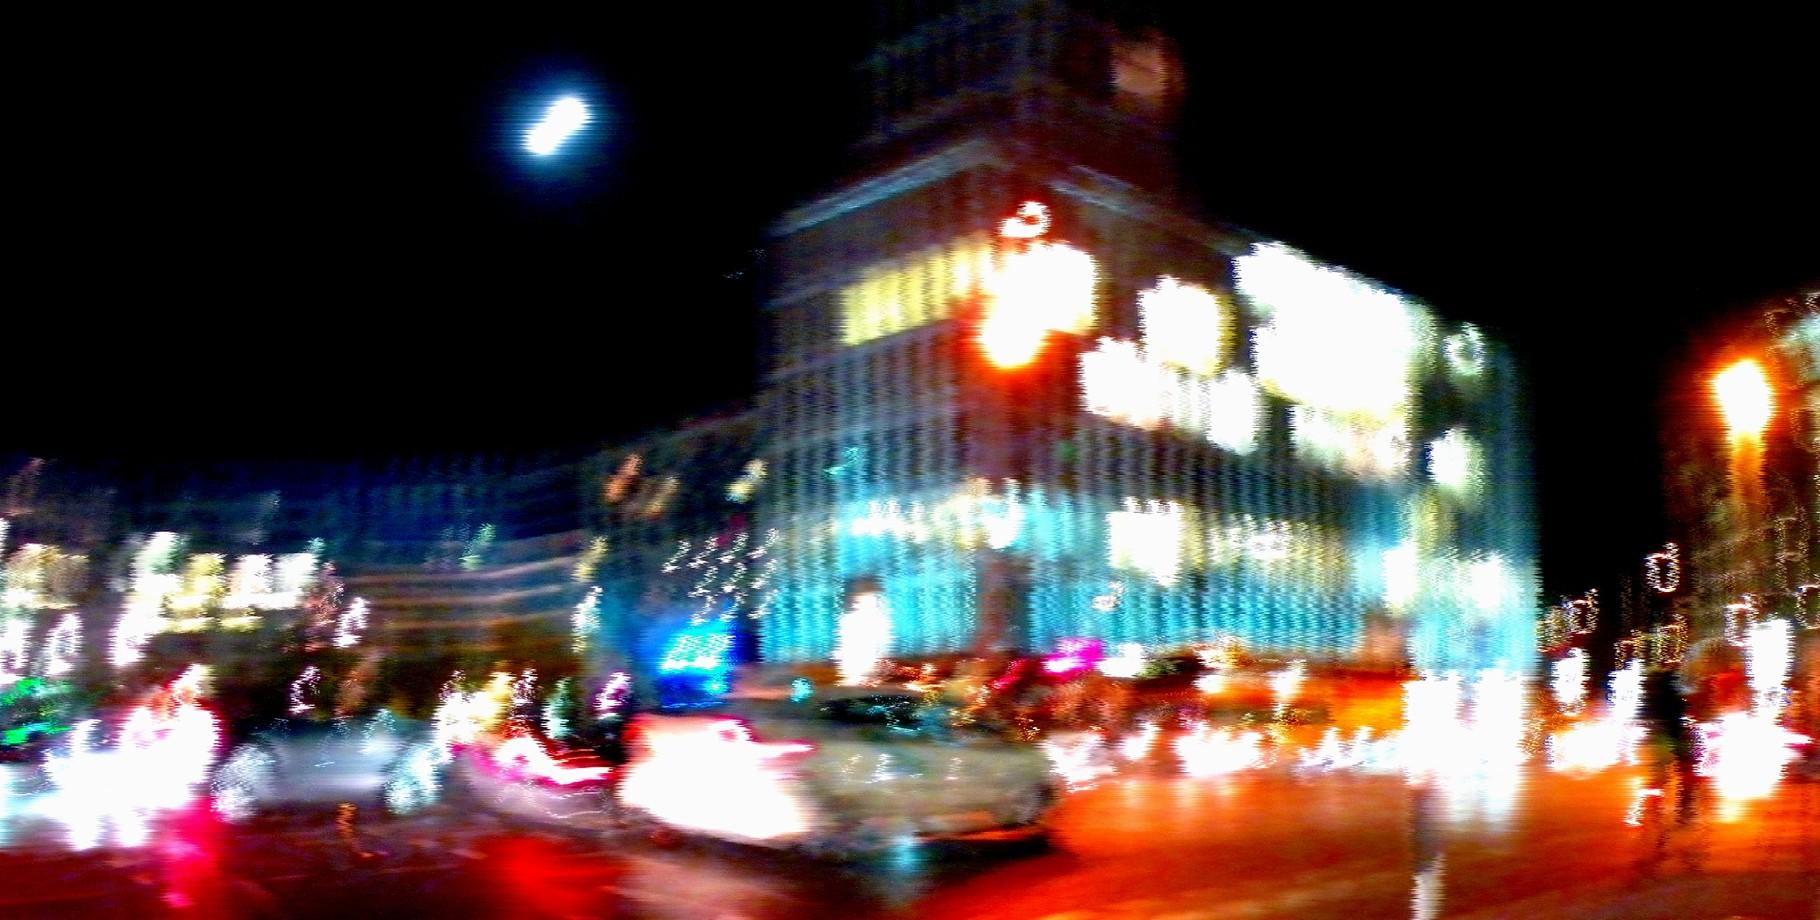 moving lights 9, 2014